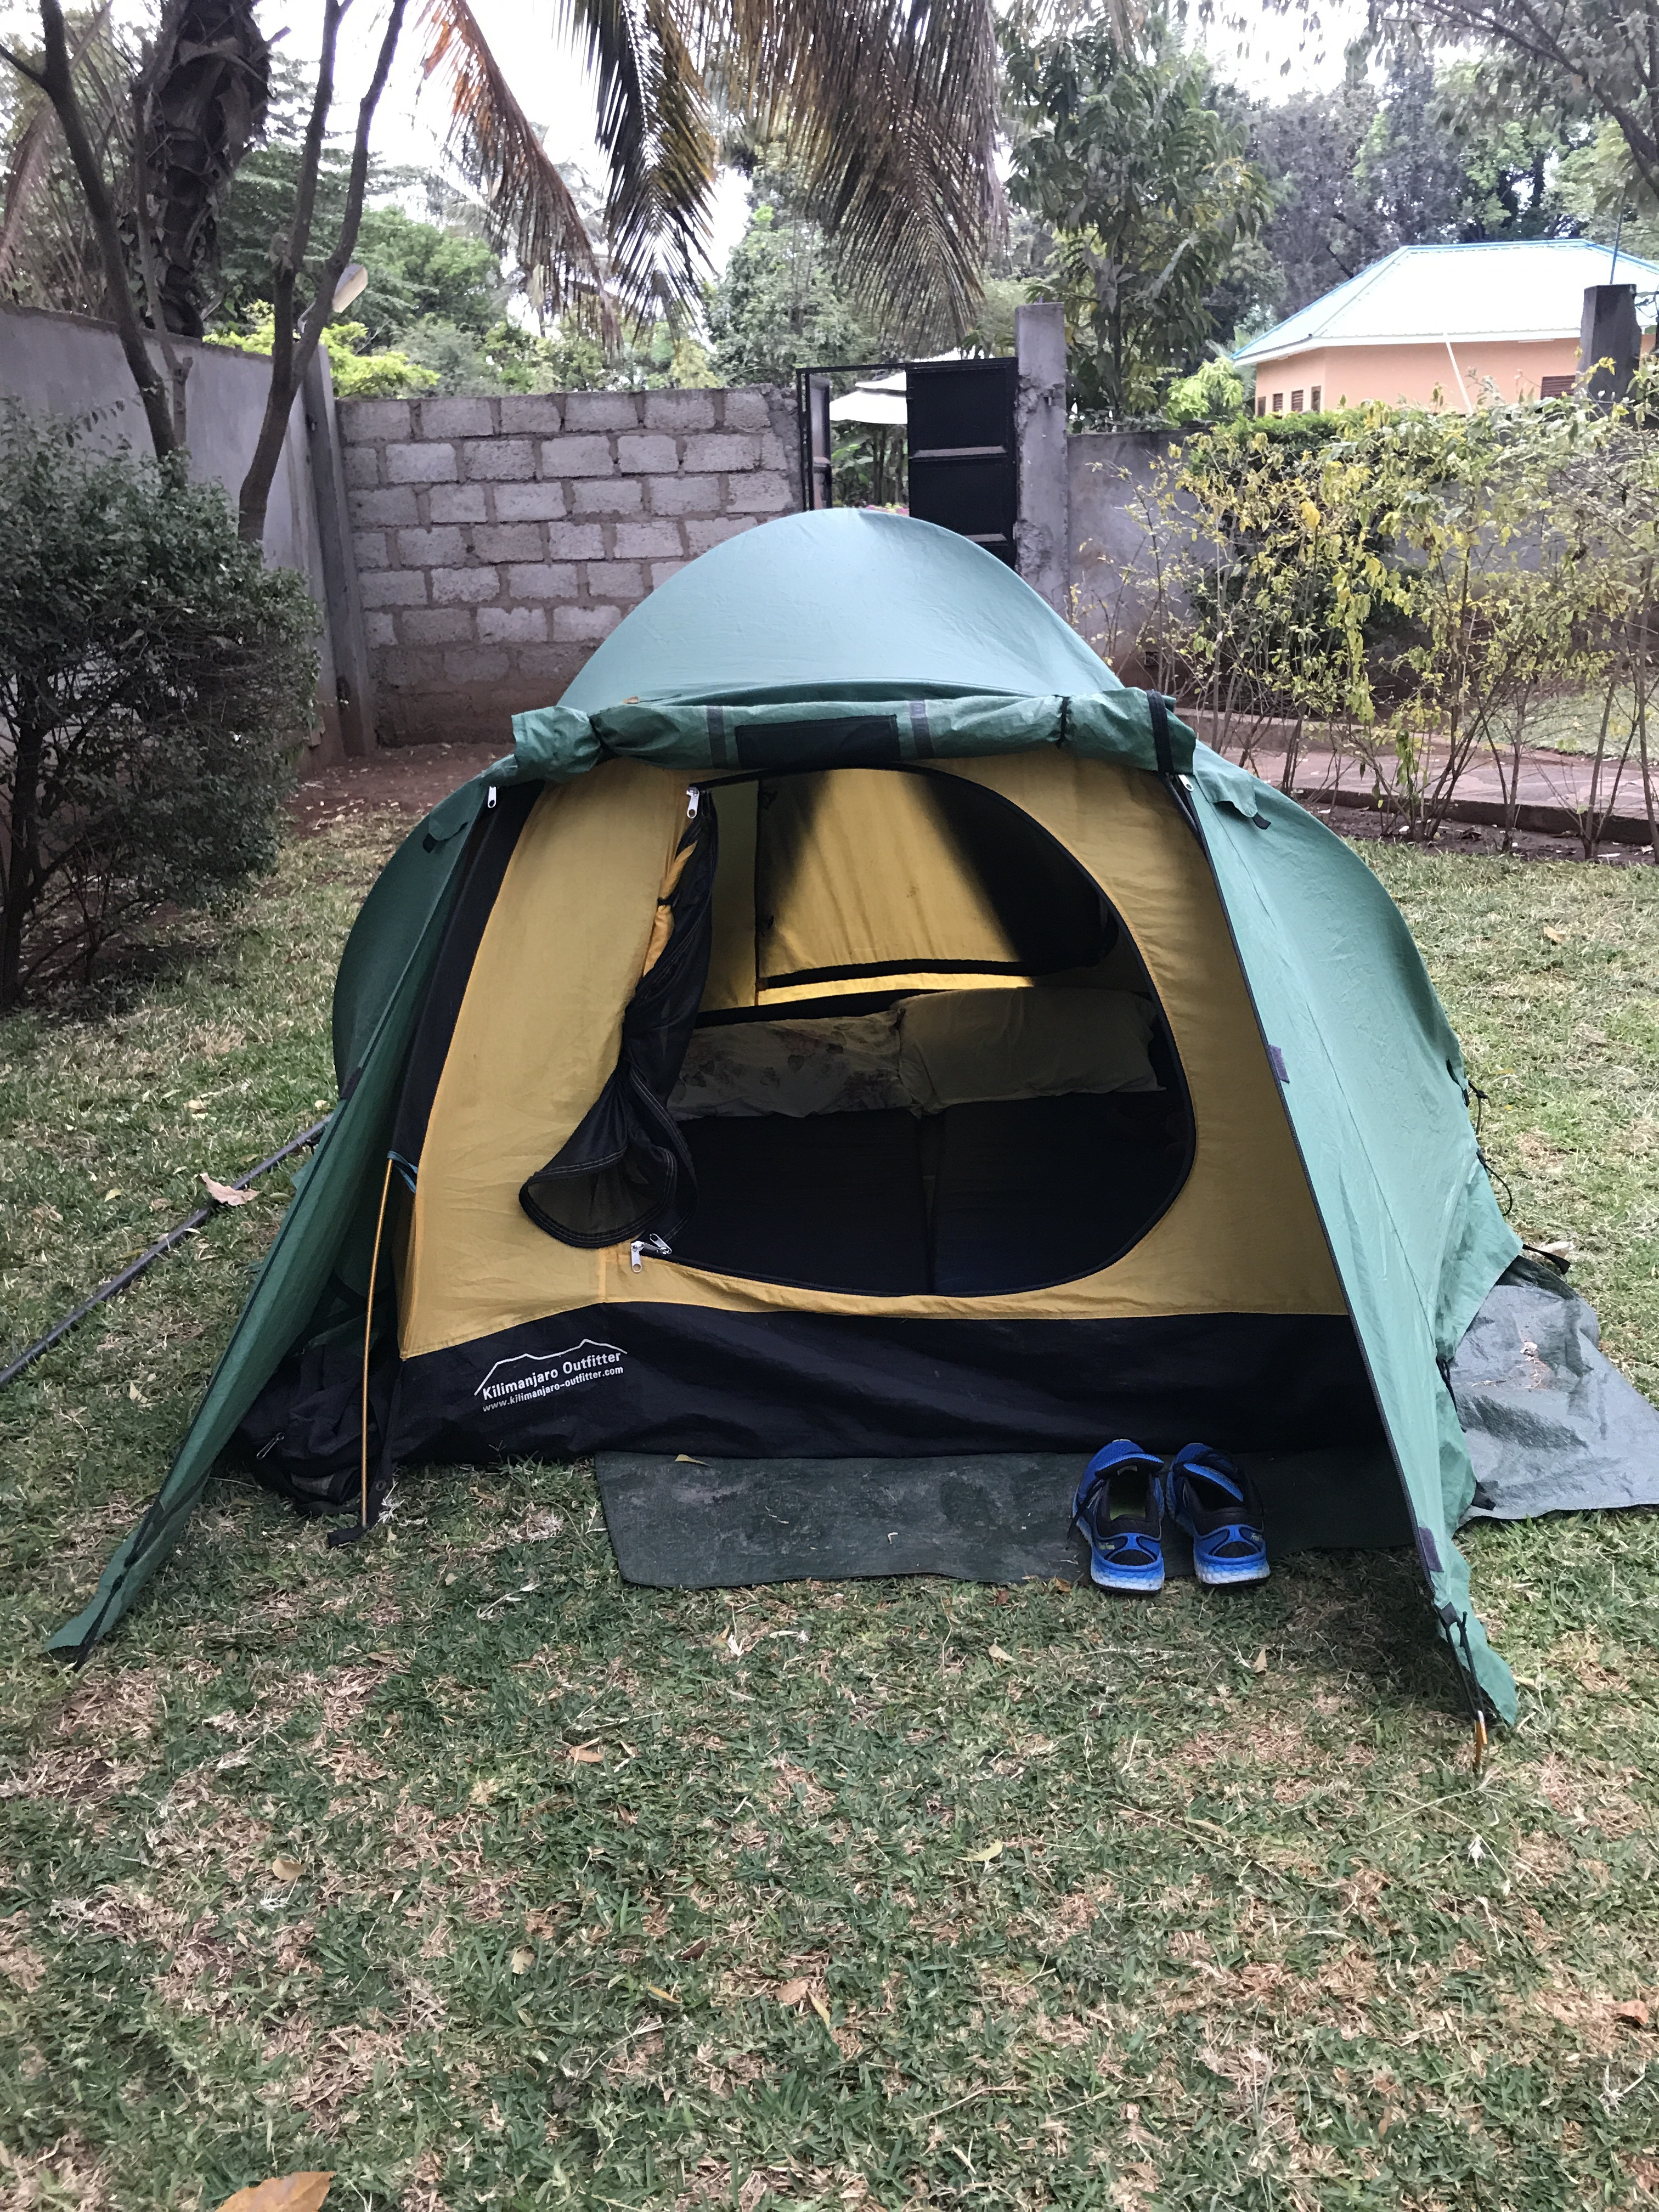 tanzania safari september 16 u2013 21 2017 u2013 catie the explorer